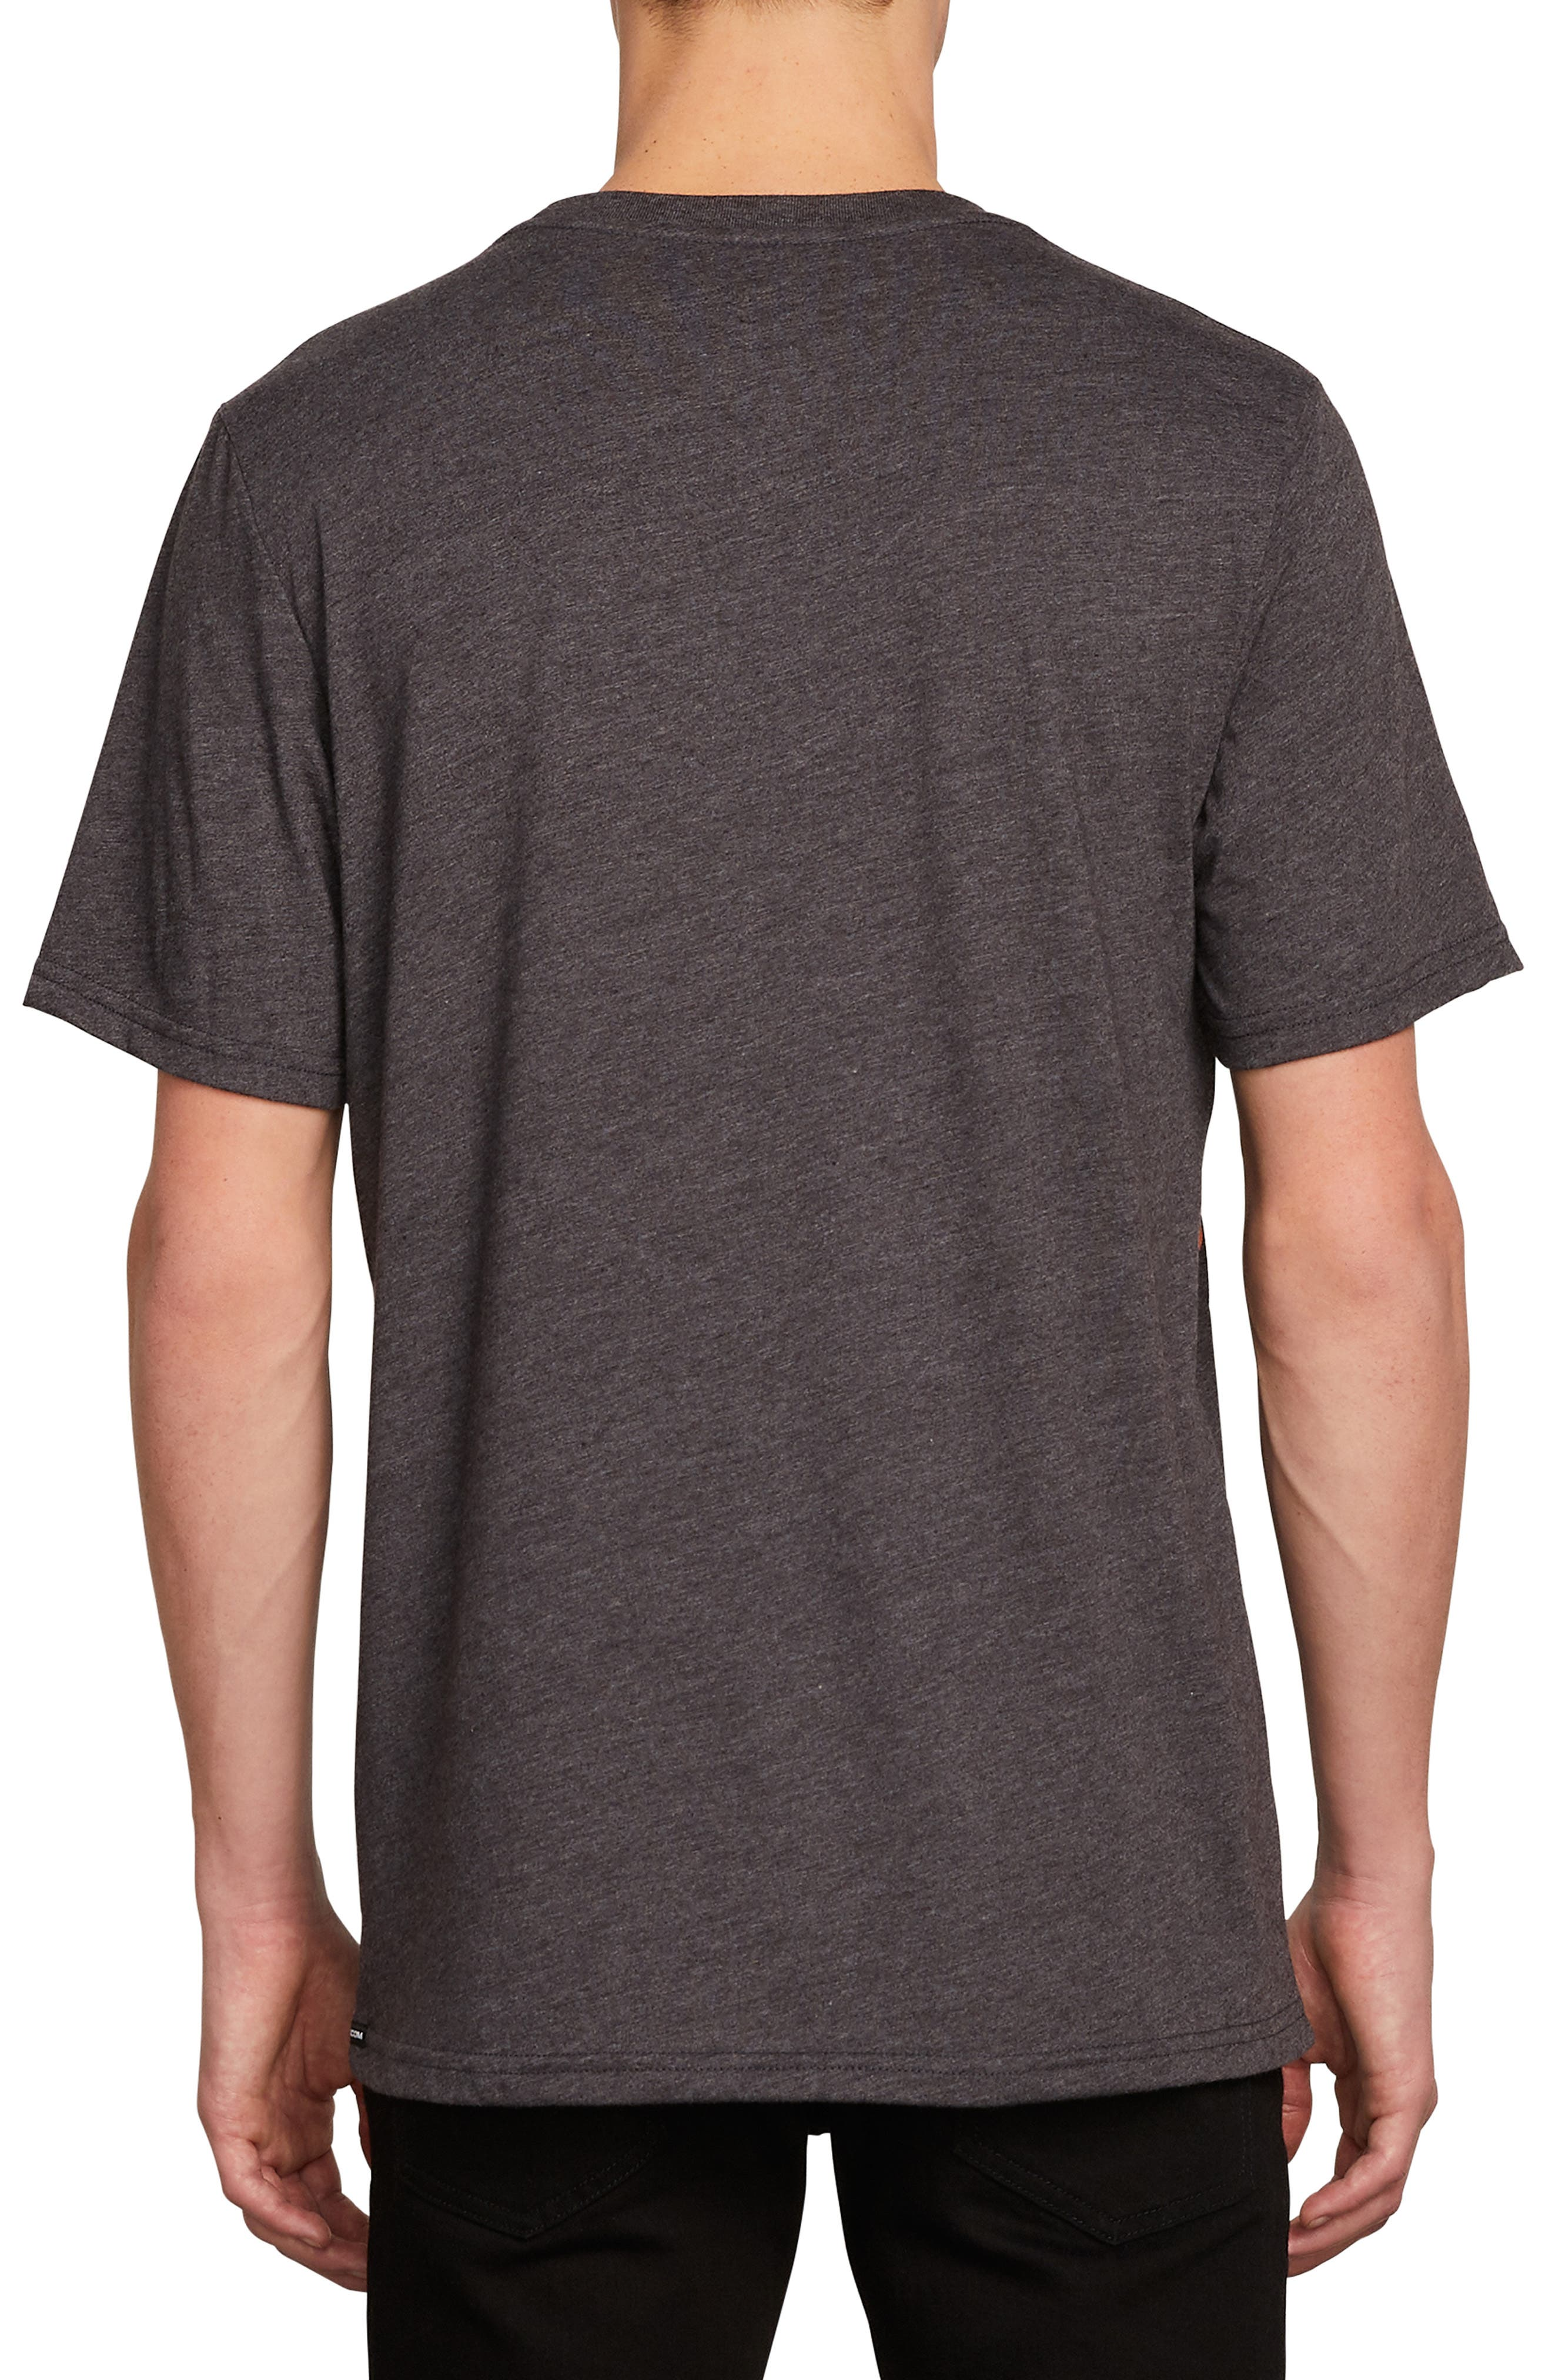 Garden Print Pocket T-Shirt,                             Alternate thumbnail 2, color,                             BLACK HEATHER